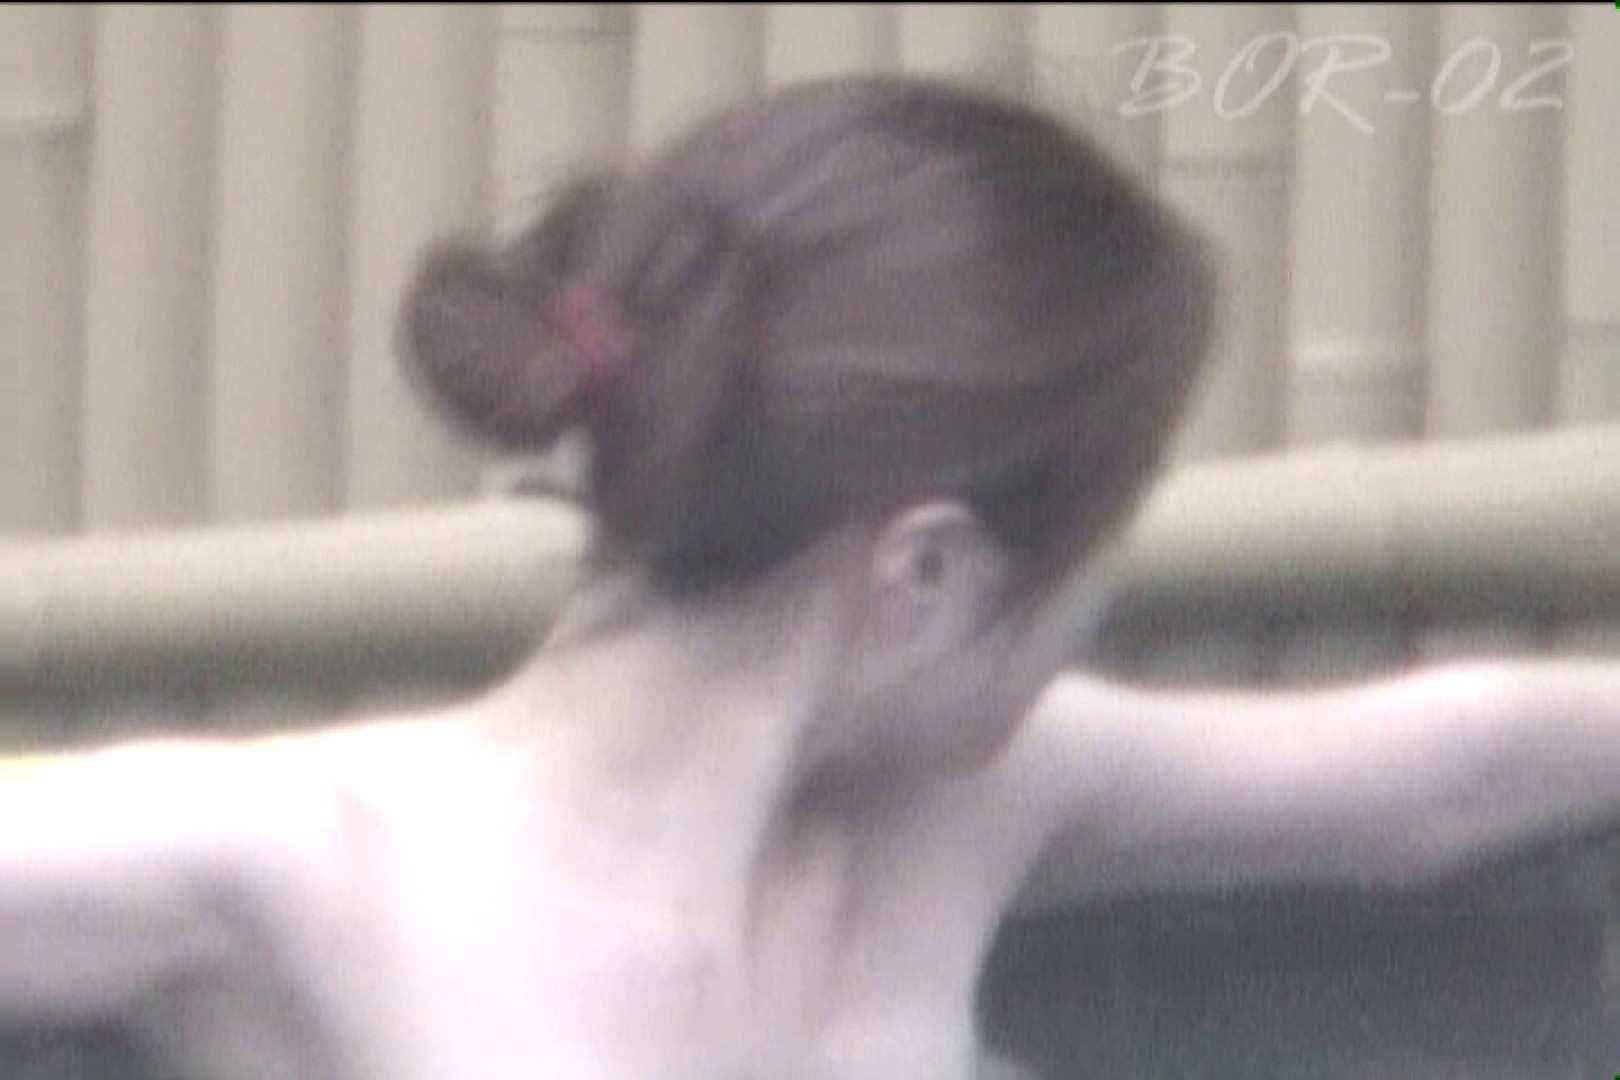 Aquaな露天風呂Vol.474 美しいOLの裸体 | 露天風呂突入  84pic 82